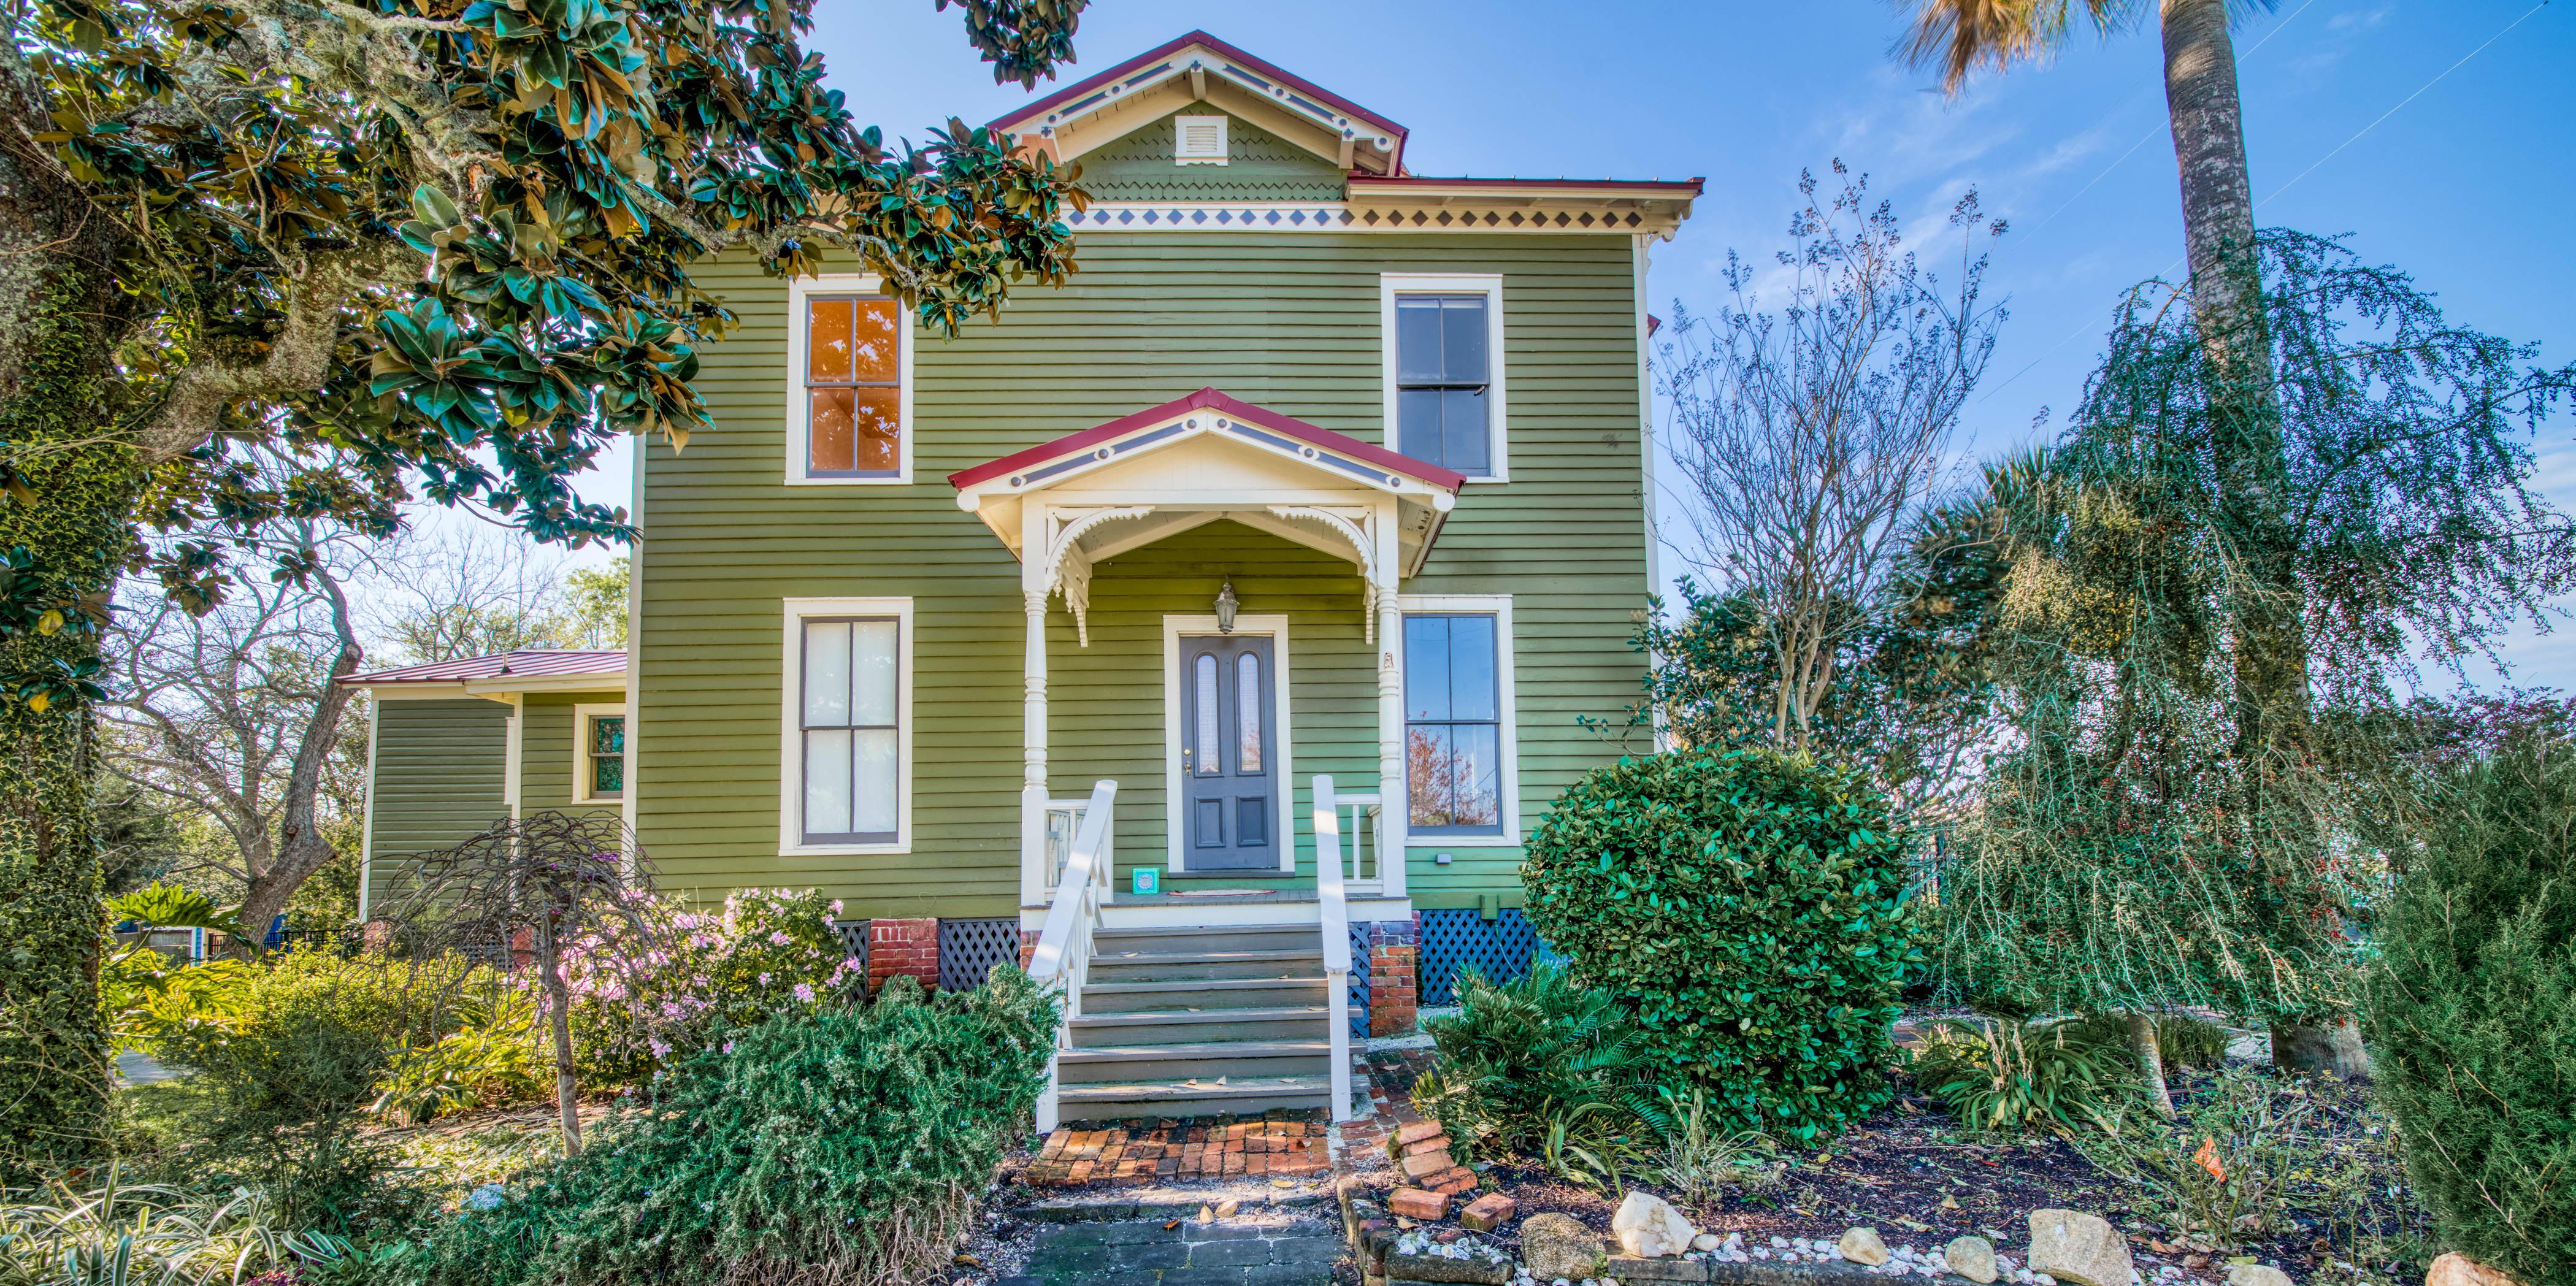 Checking Out Pippi Longstocking From >> Pippi Longstocking S House Villa Villekulla Is For Sale